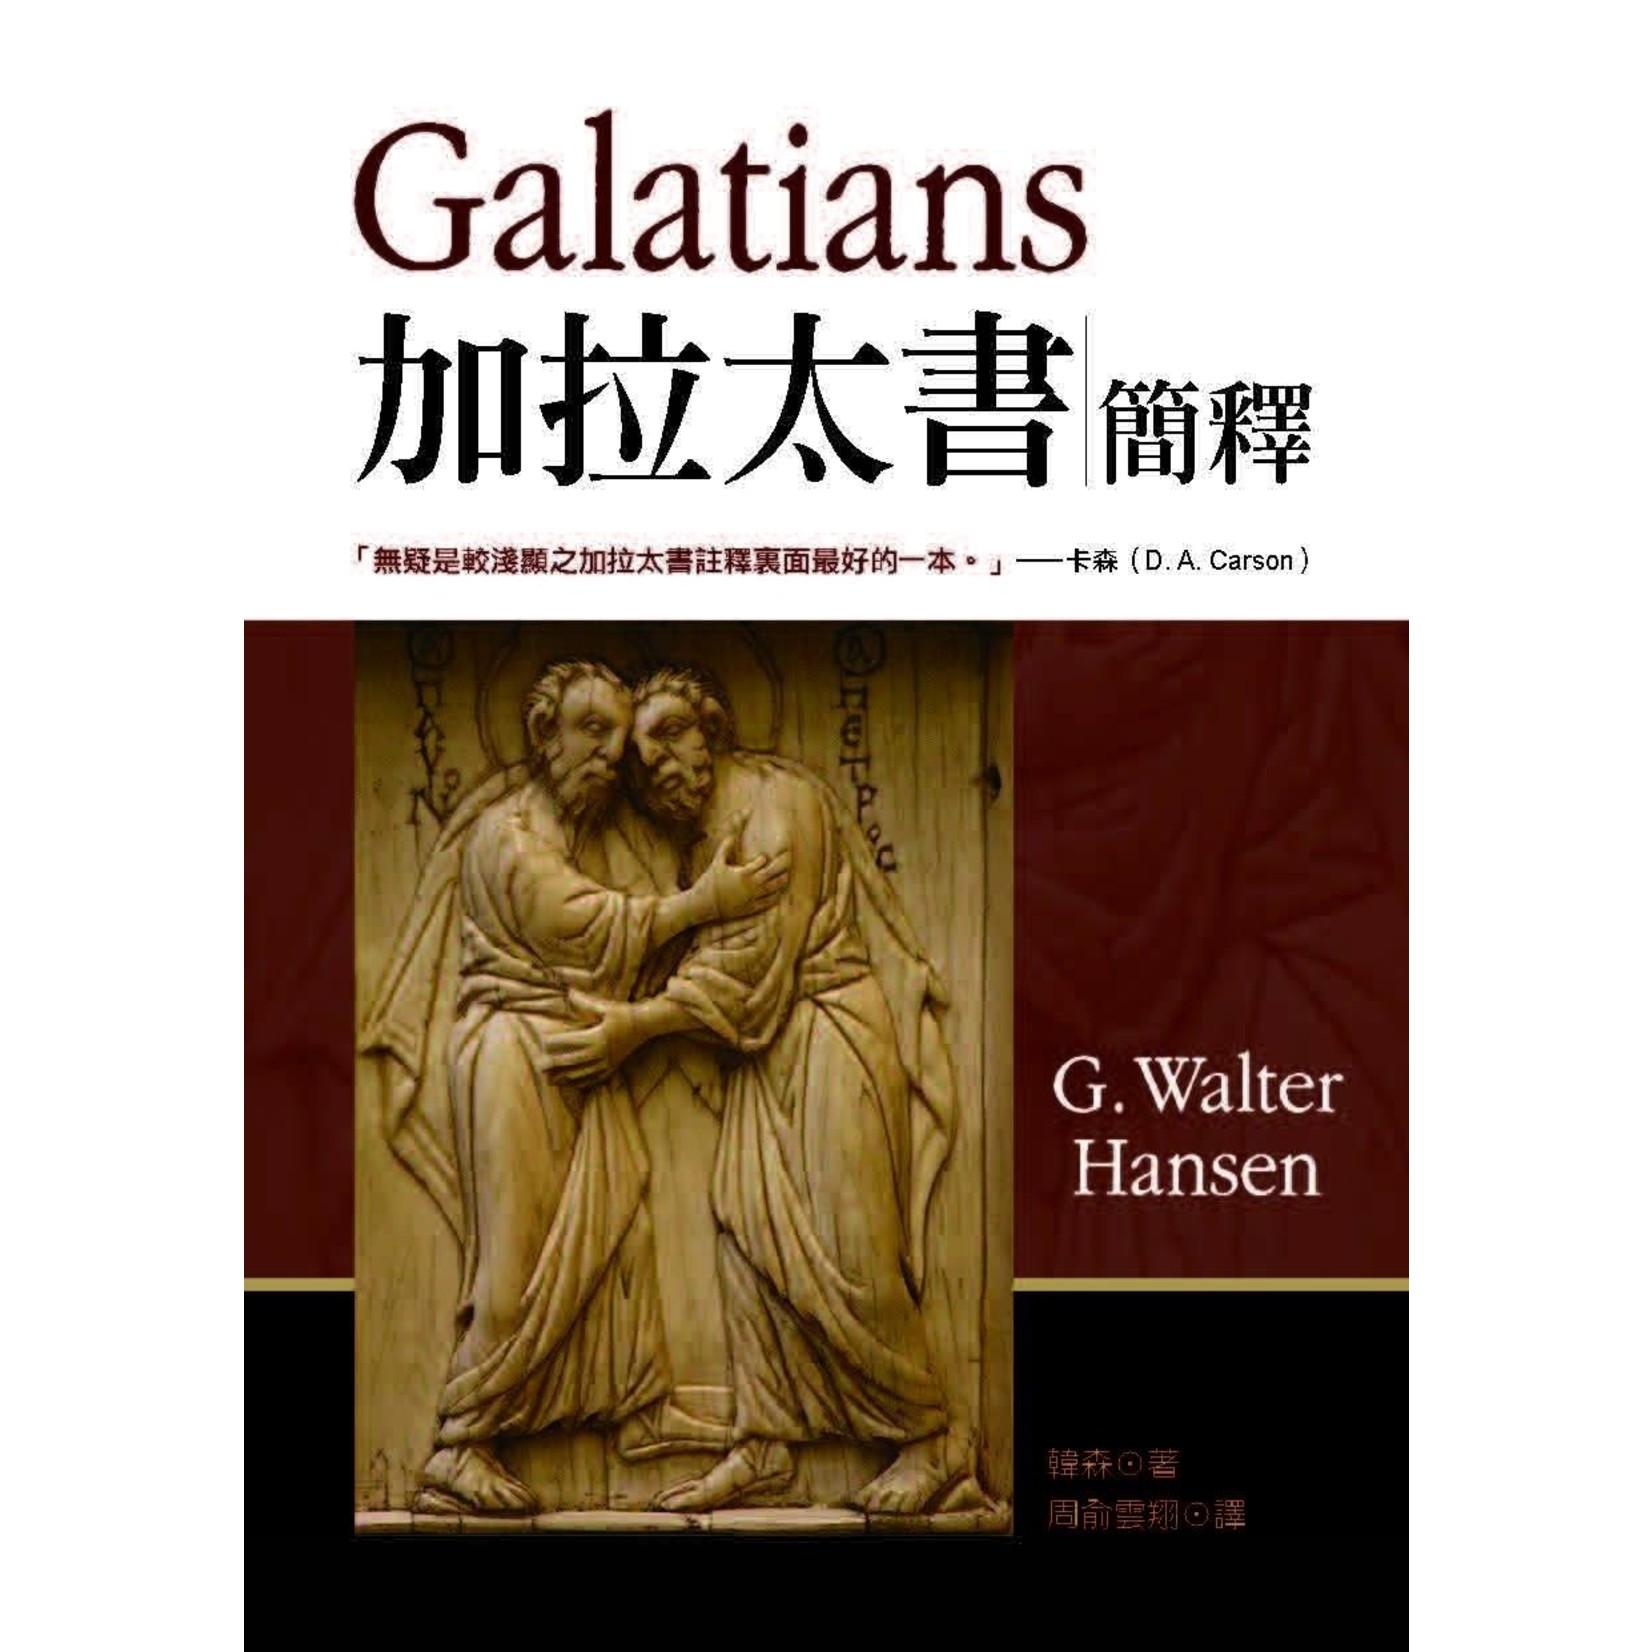 美國麥種傳道會 AKOWCM 加拉太書簡釋 Galatians(IVP New Testament Commentary Series)